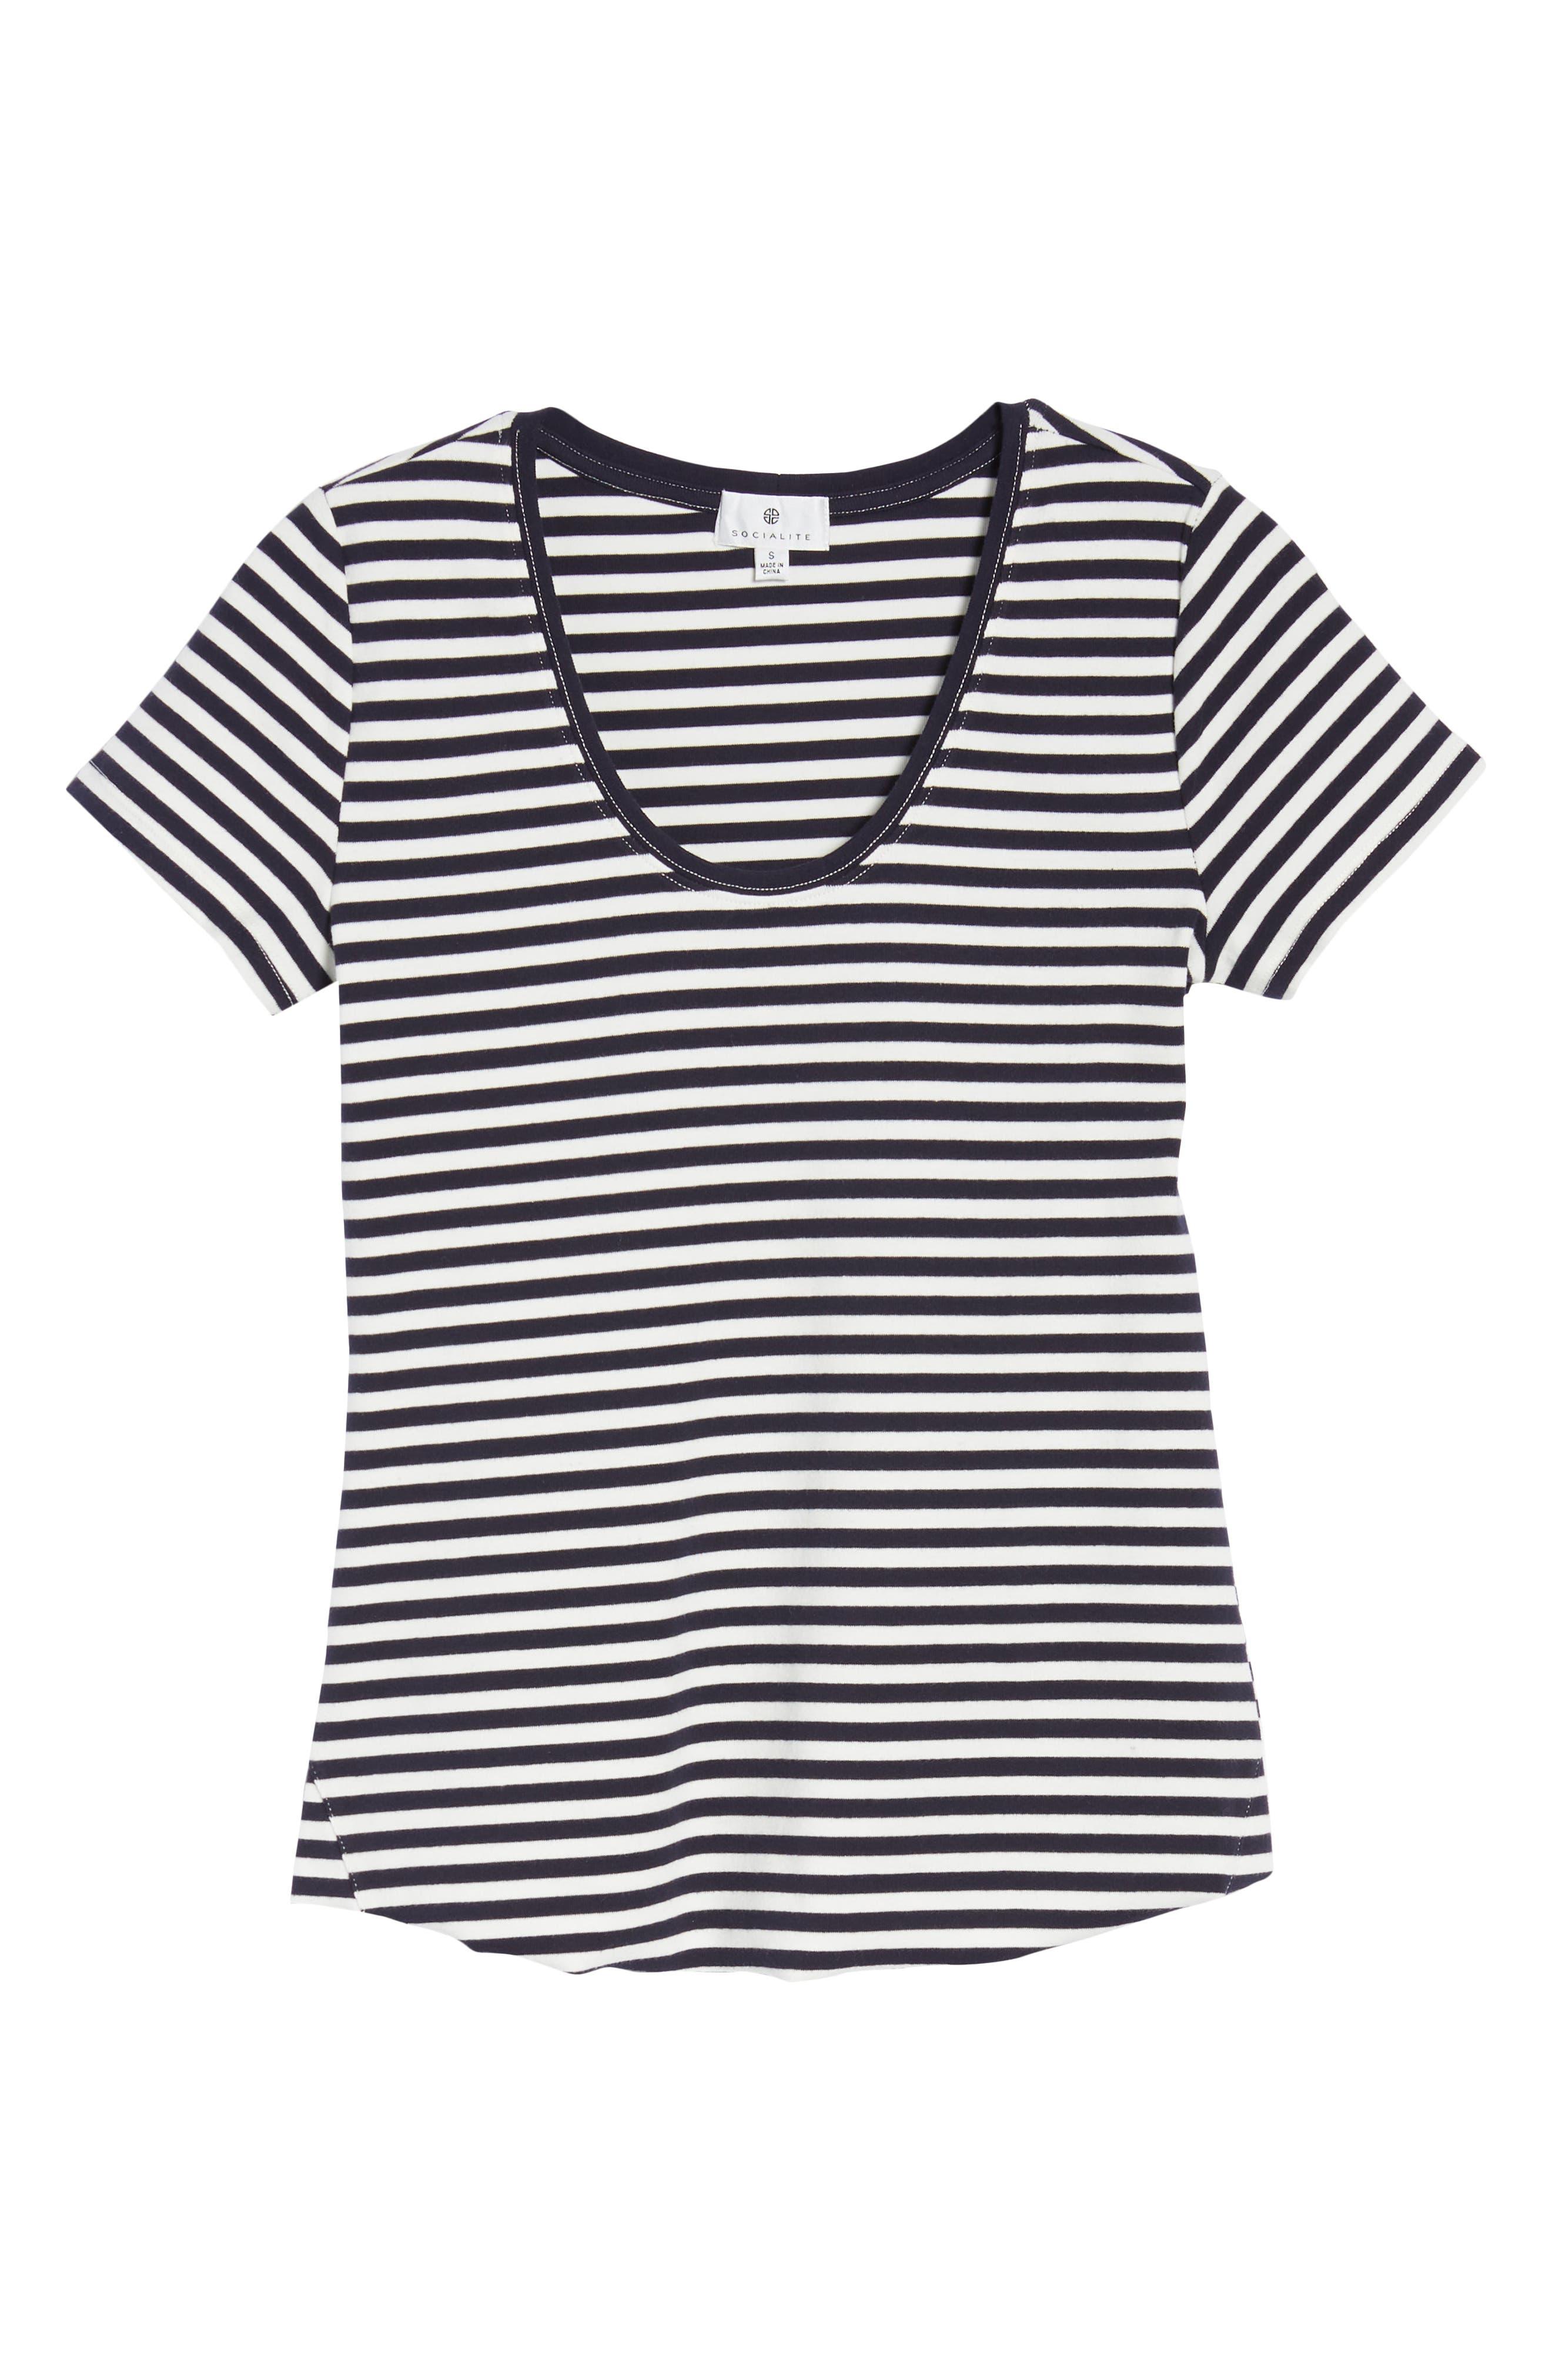 Stripe Tee,                             Alternate thumbnail 7, color,                             Navy/ White